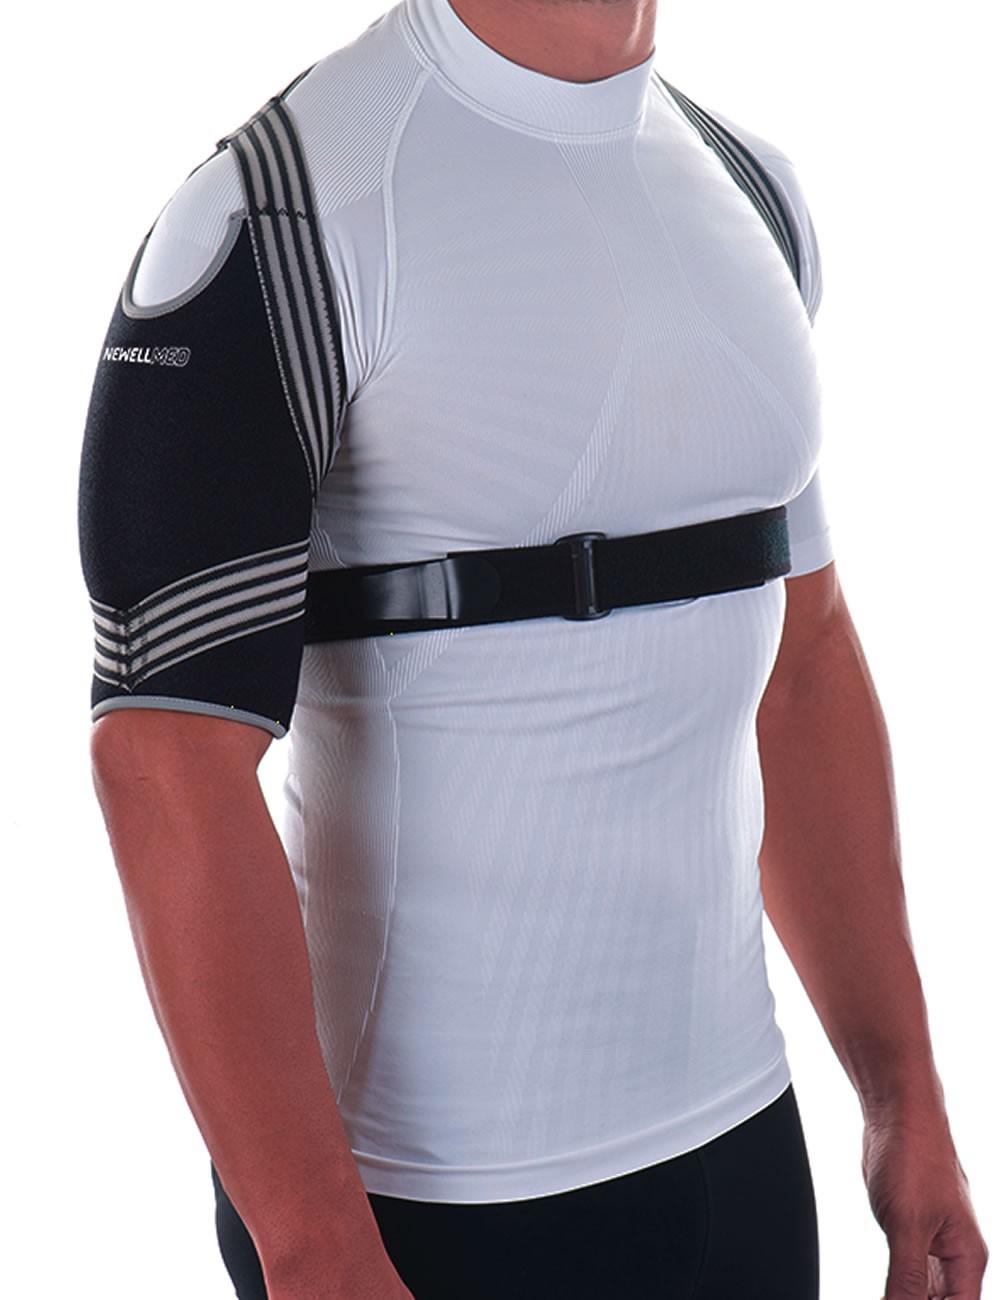 PK17 - Functionally shoulder support